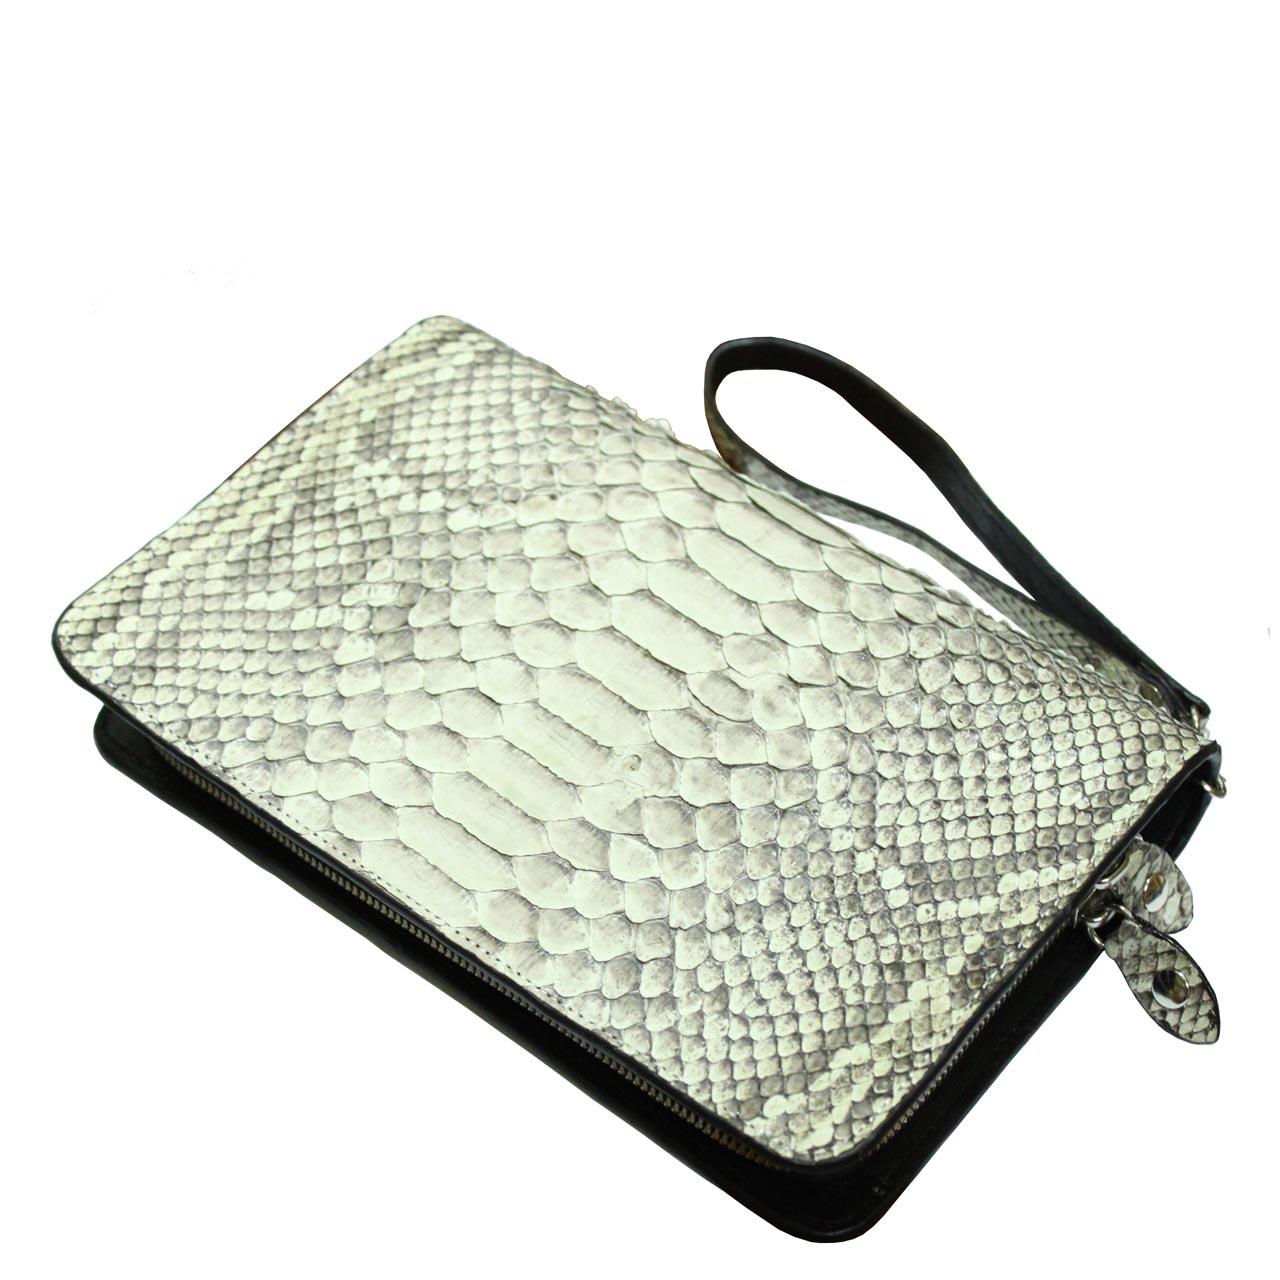 Python Leather Purse T305a